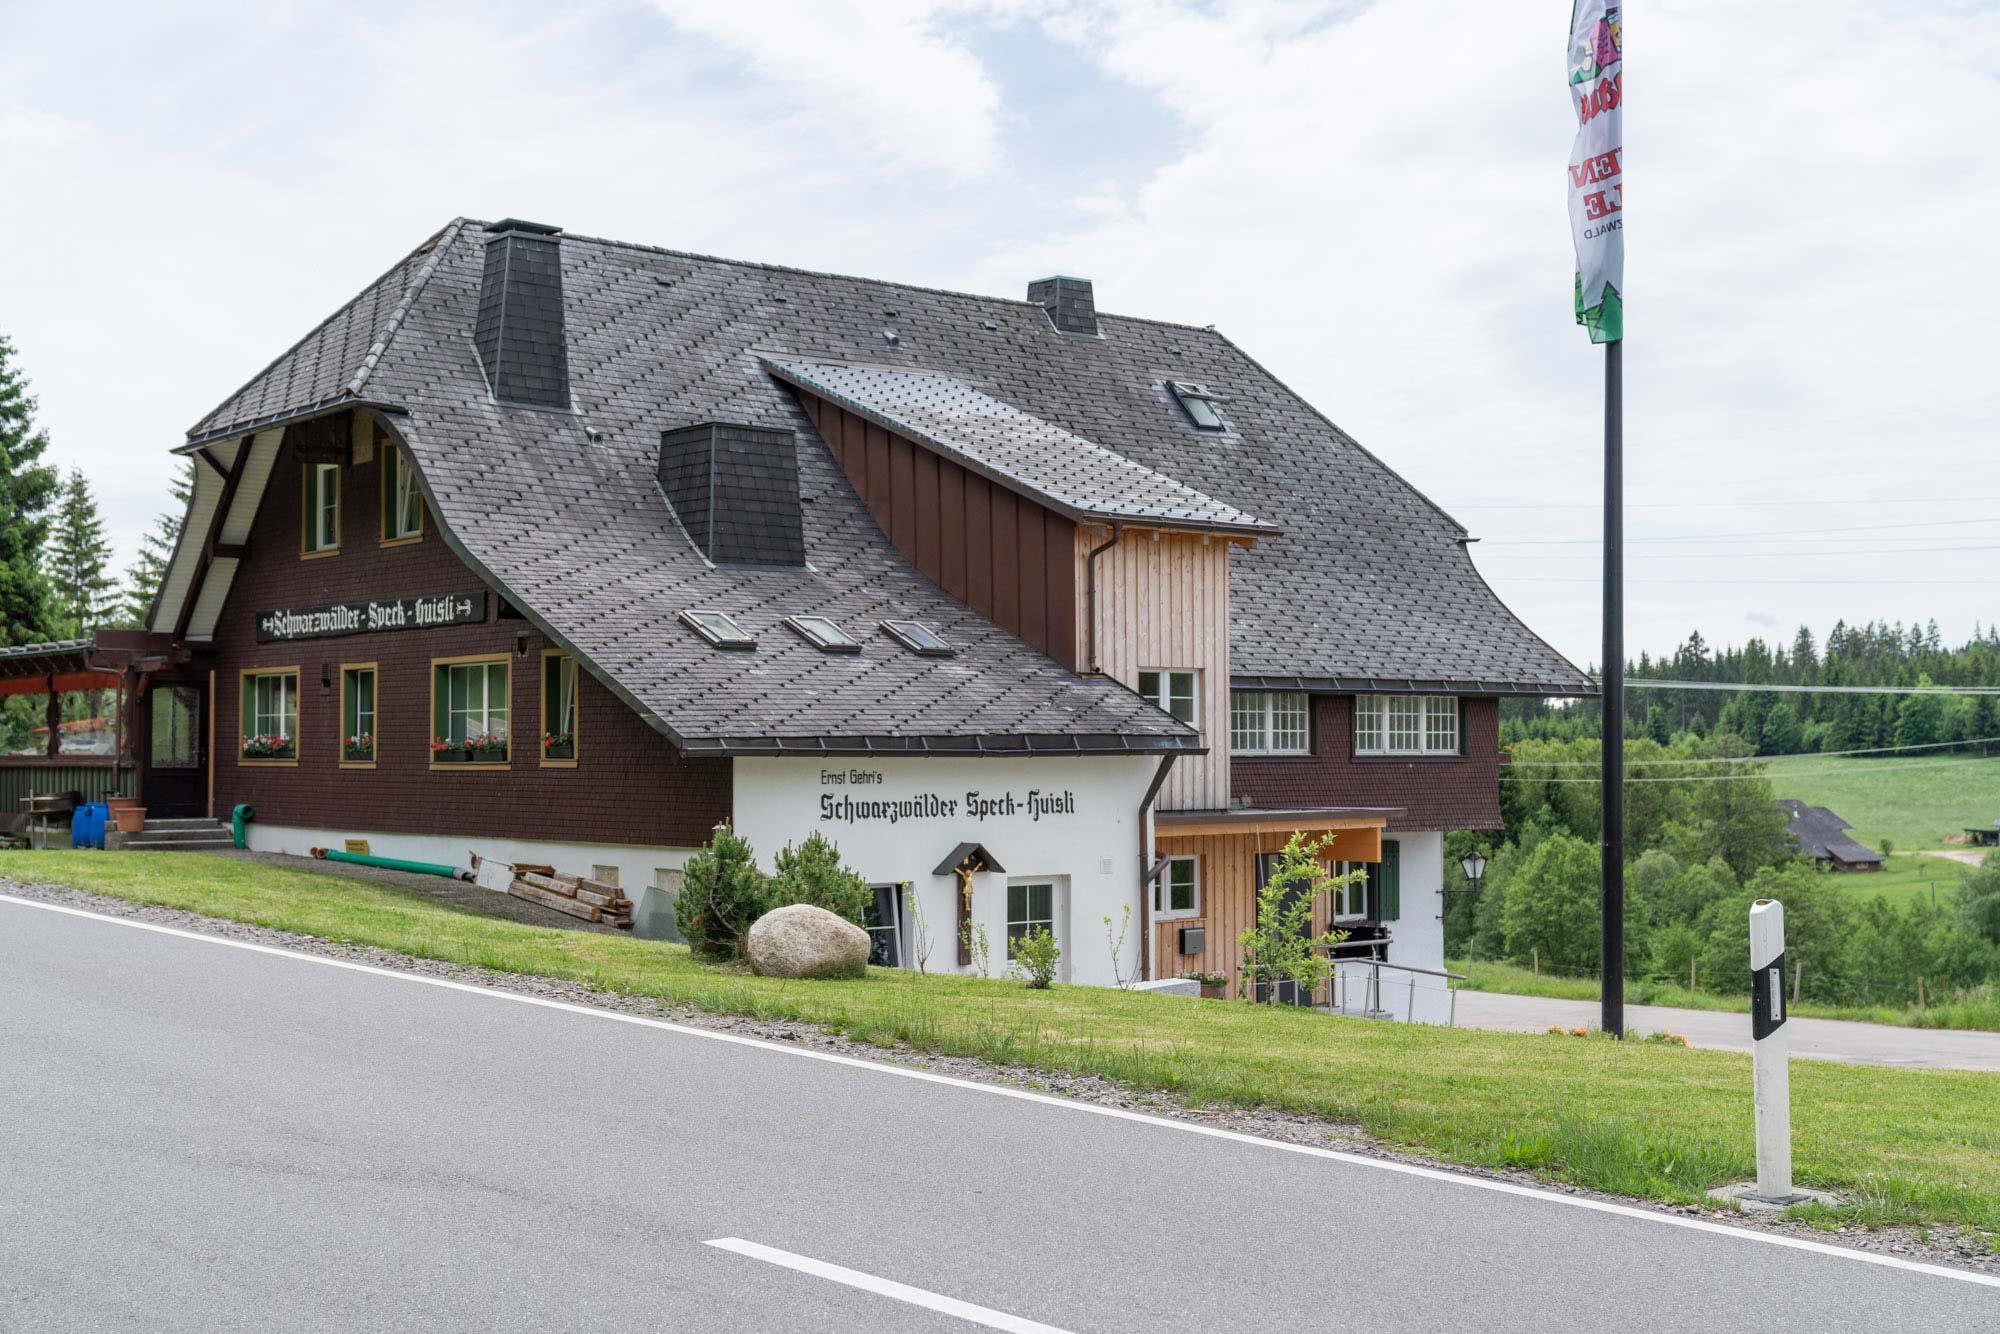 Architekturbüro Kaiser Referenz Schwarzwälder Speckhuisli